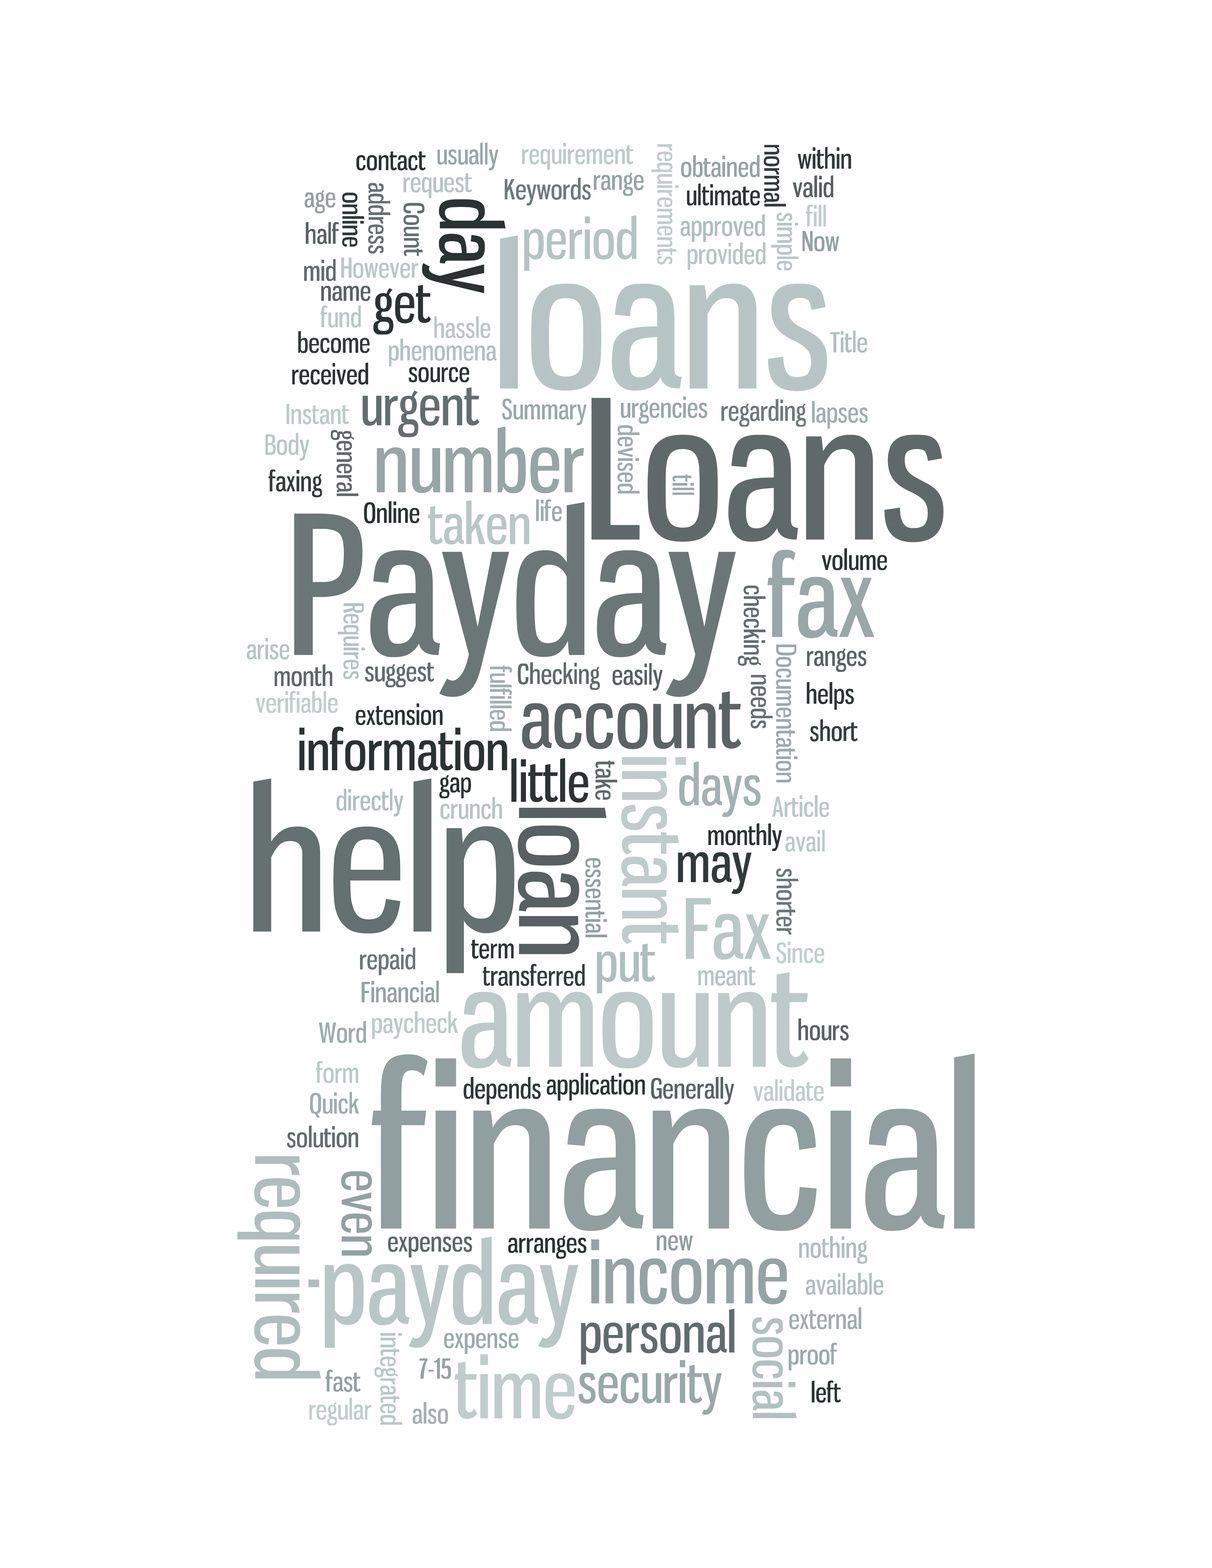 Swift money payday loans photo 5